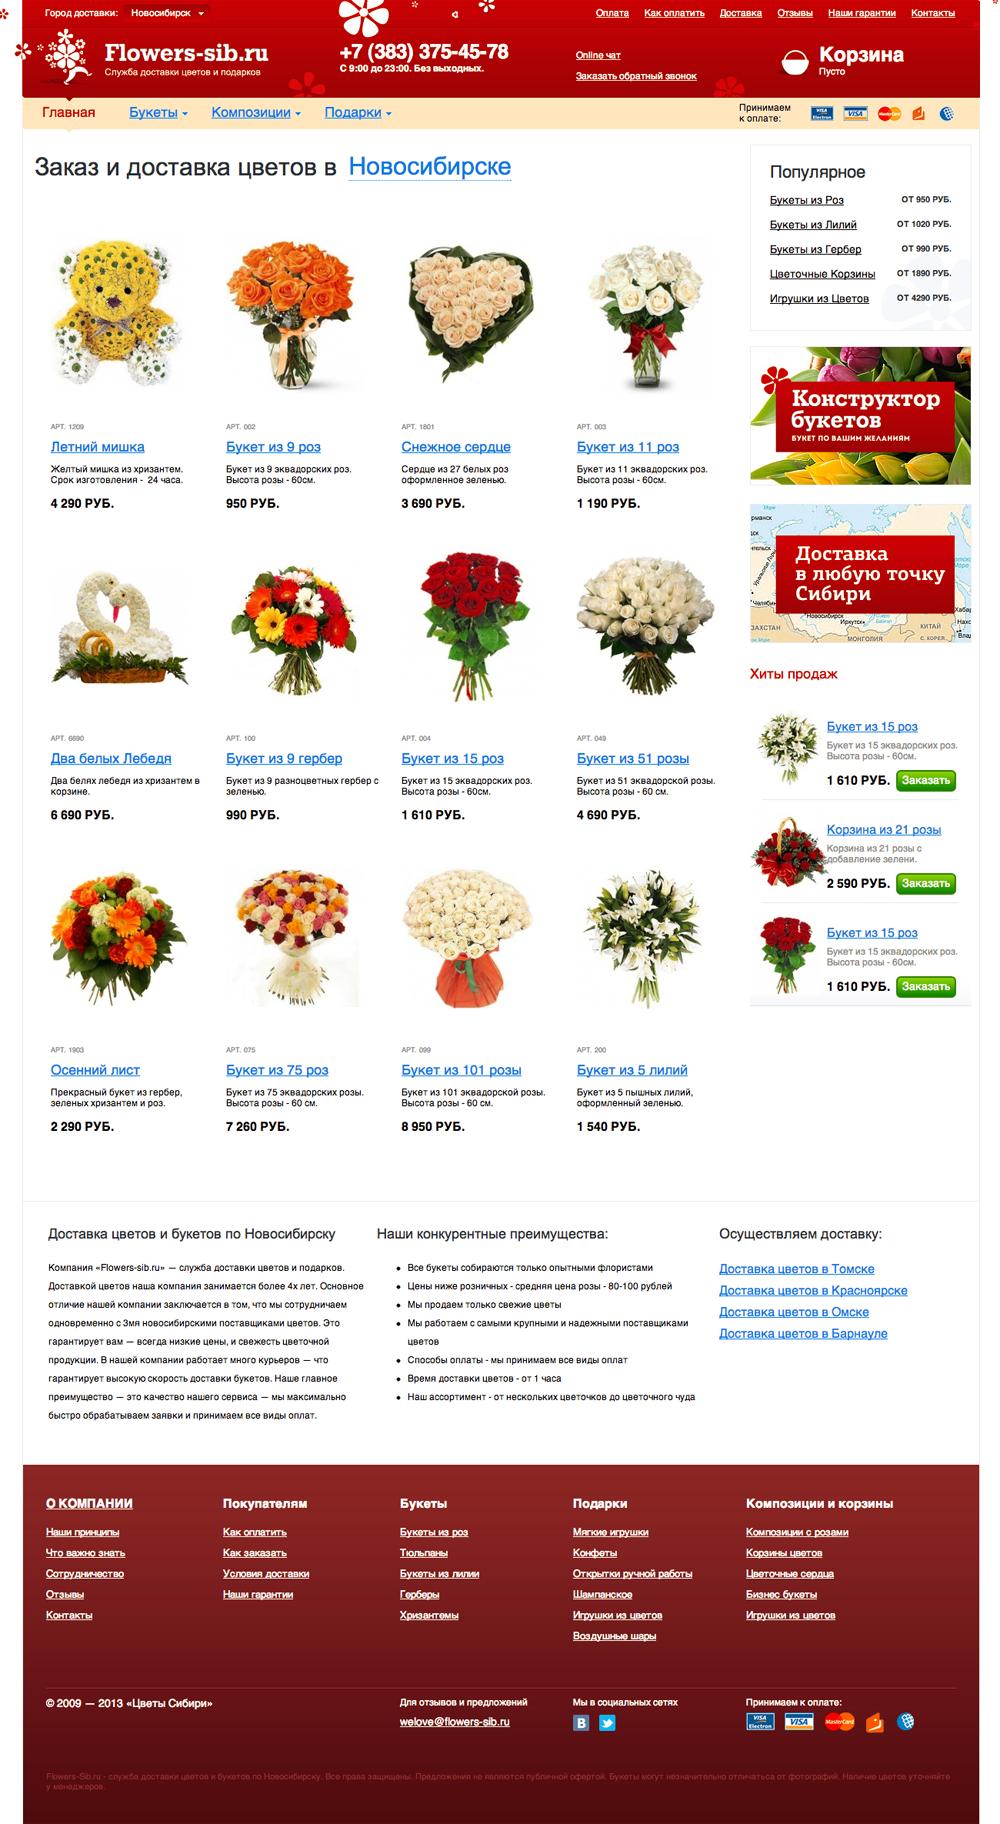 Интернет-магазин flowers-sib.ru